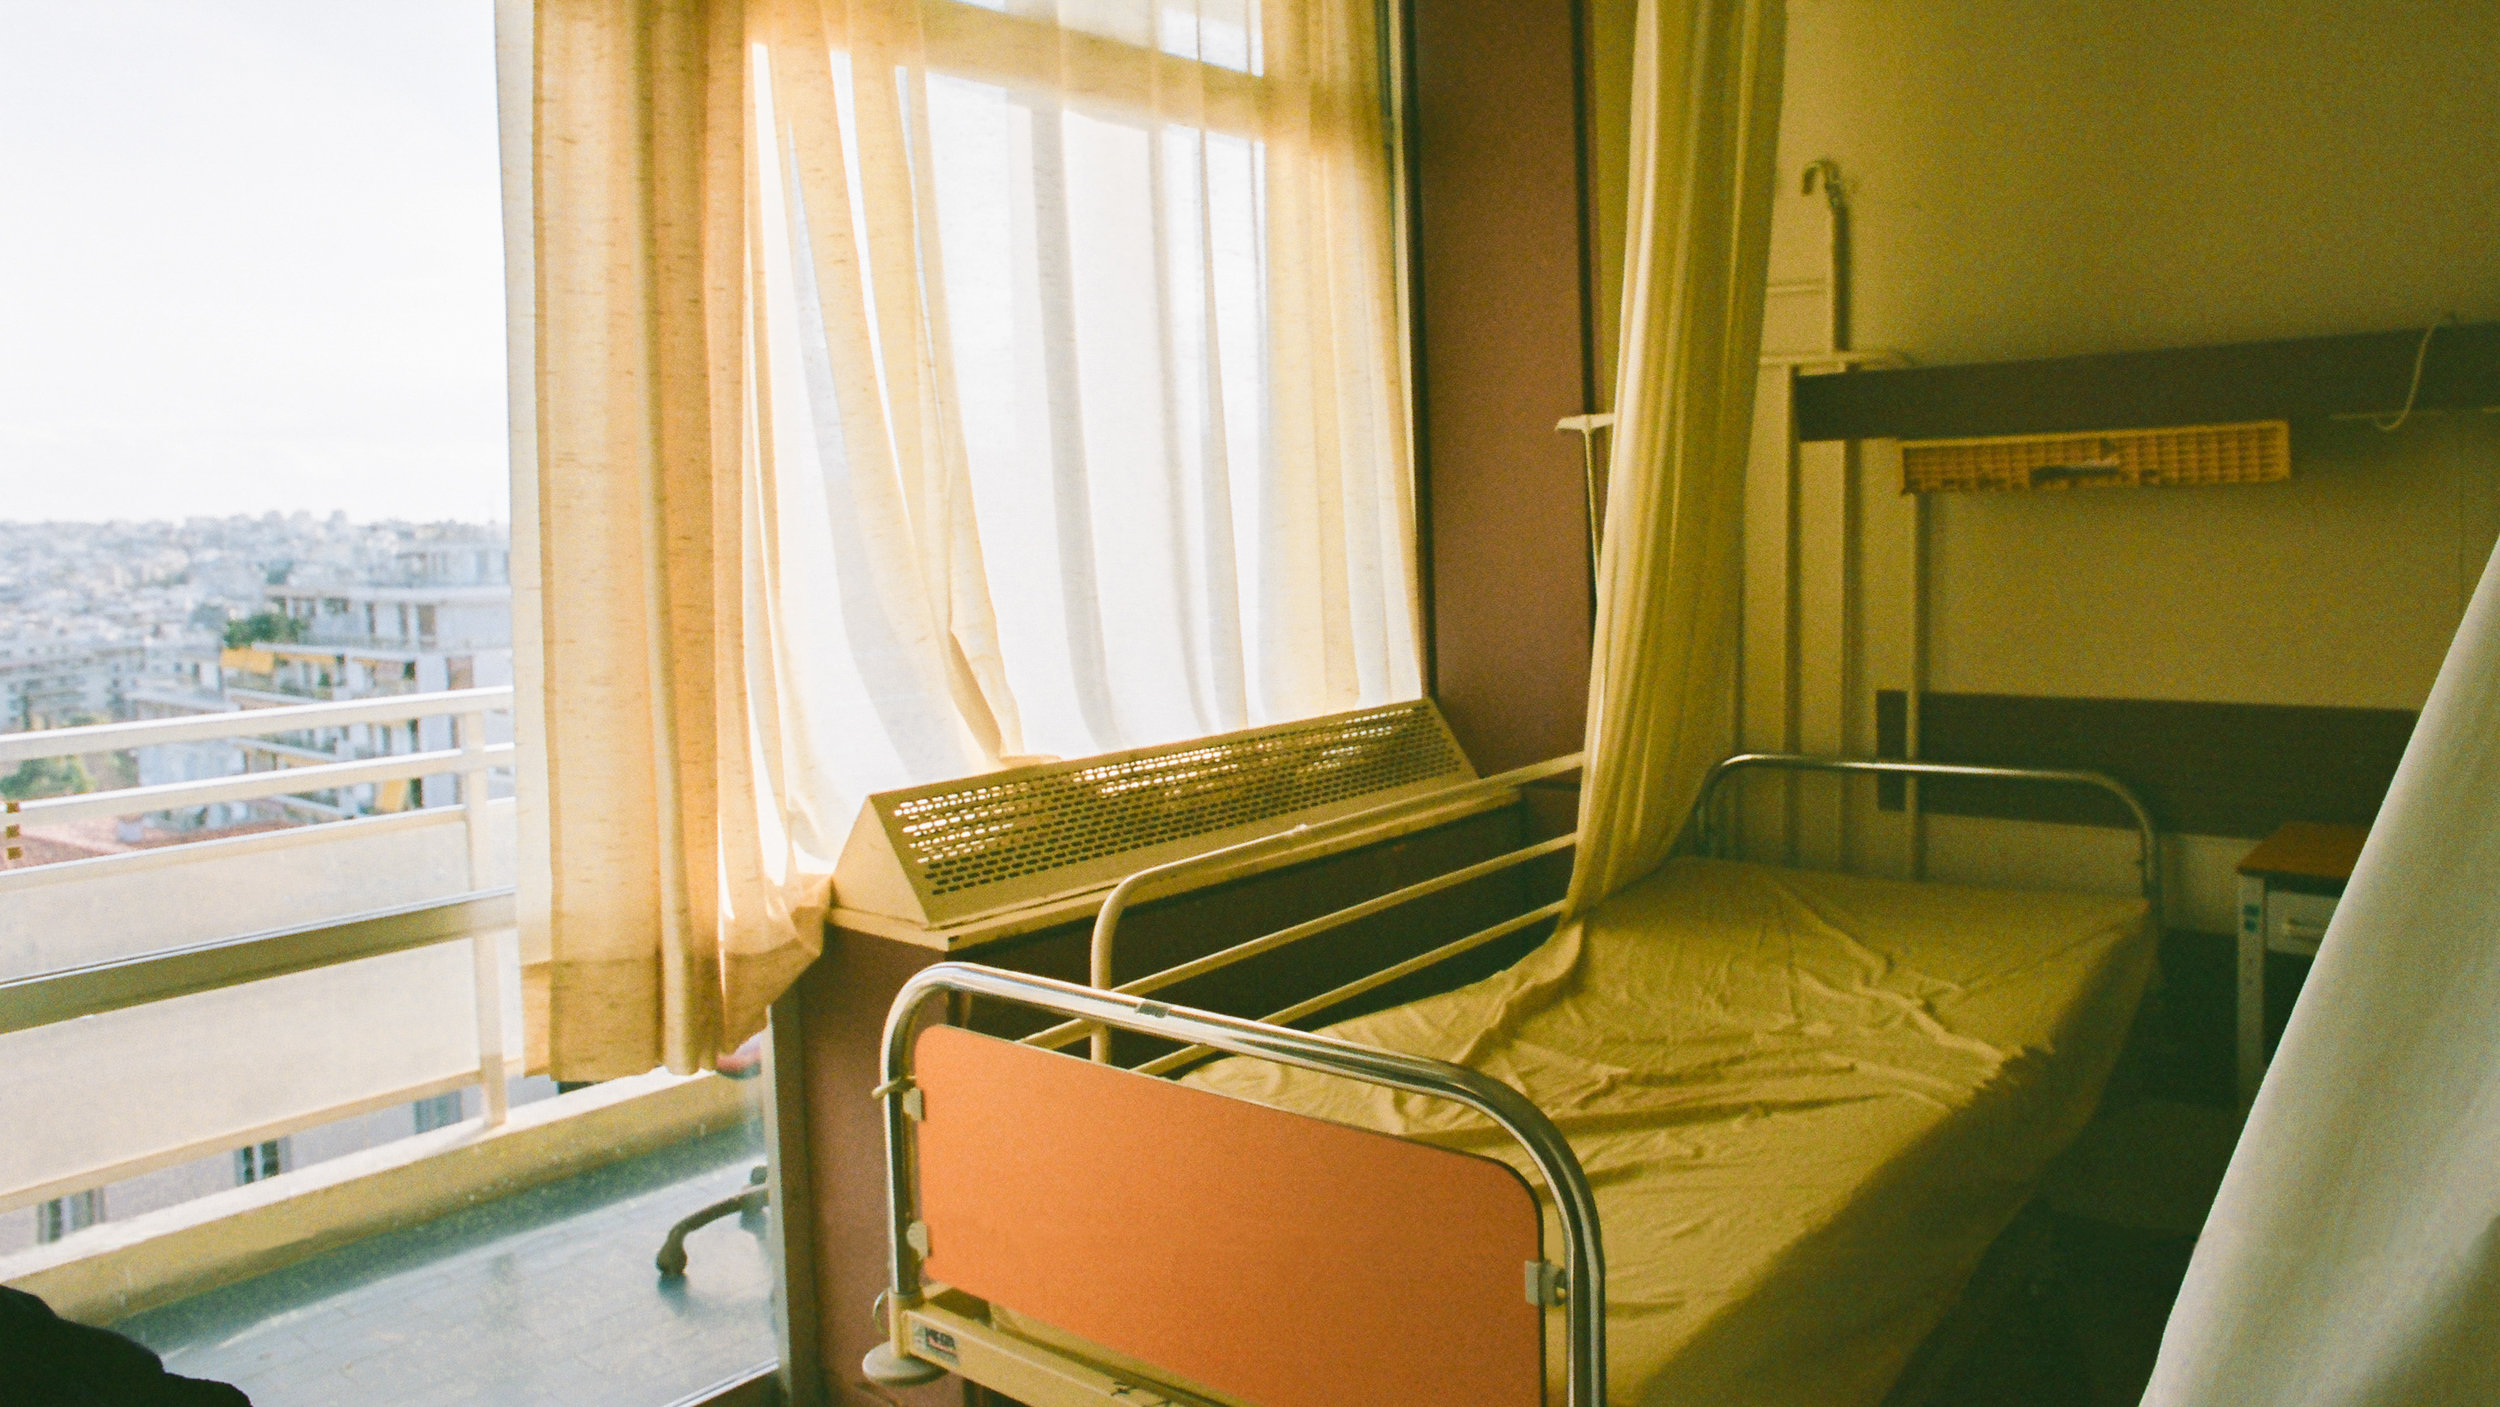 20190129-Hospital 3.jpg